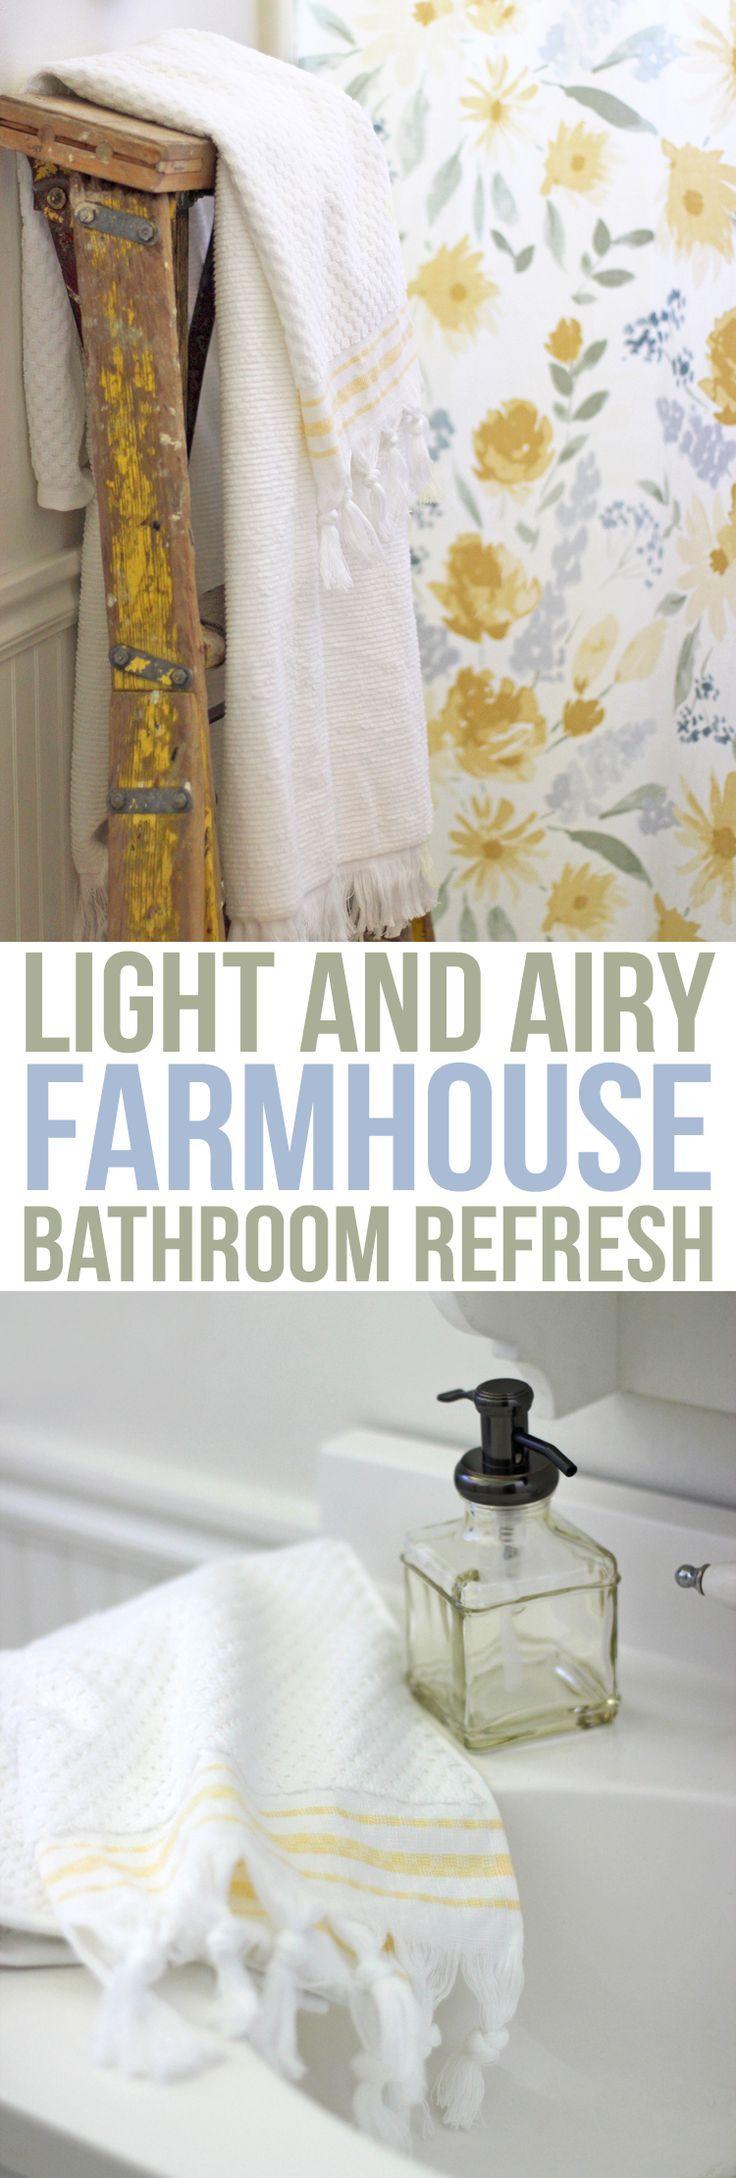 488 best inspire baths images on pinterest bathroom ideas